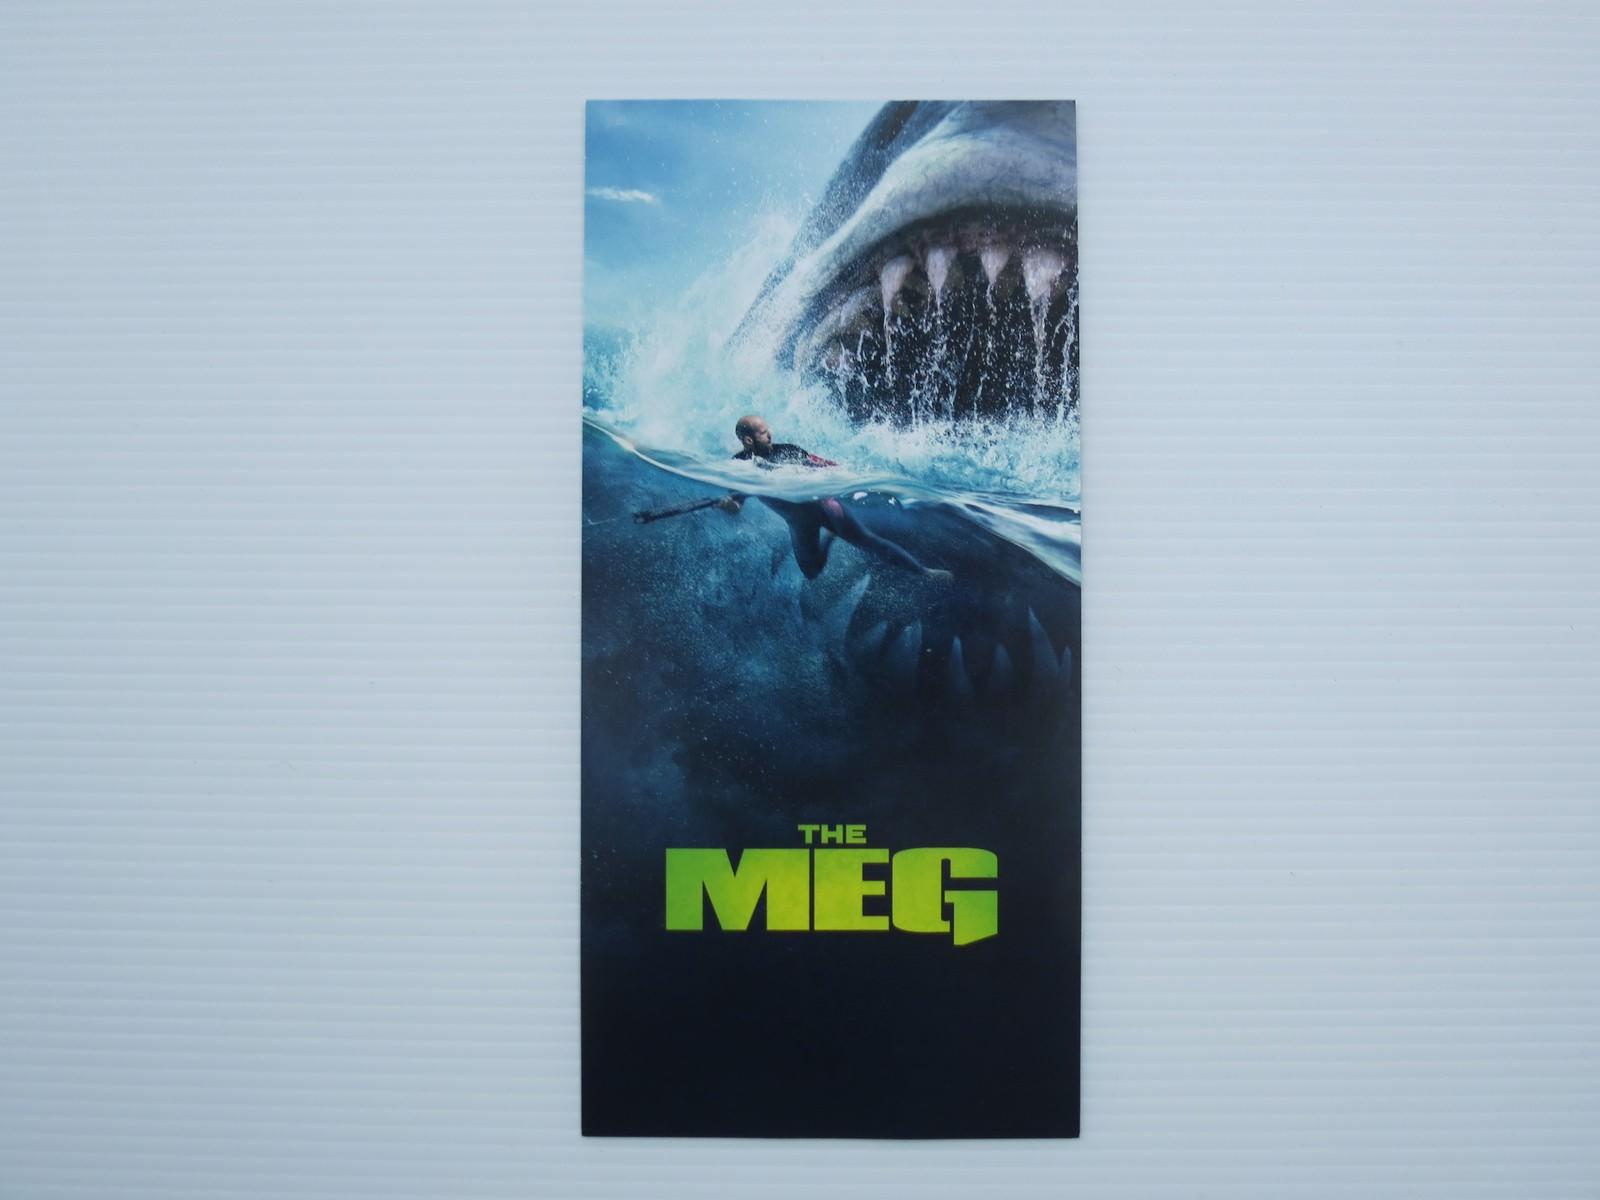 Movie, The Meg(美國.中國, 2018) / 巨齒鯊(台) / 巨齿鲨(中) / 極悍巨鯊(港), 特映會邀請卡